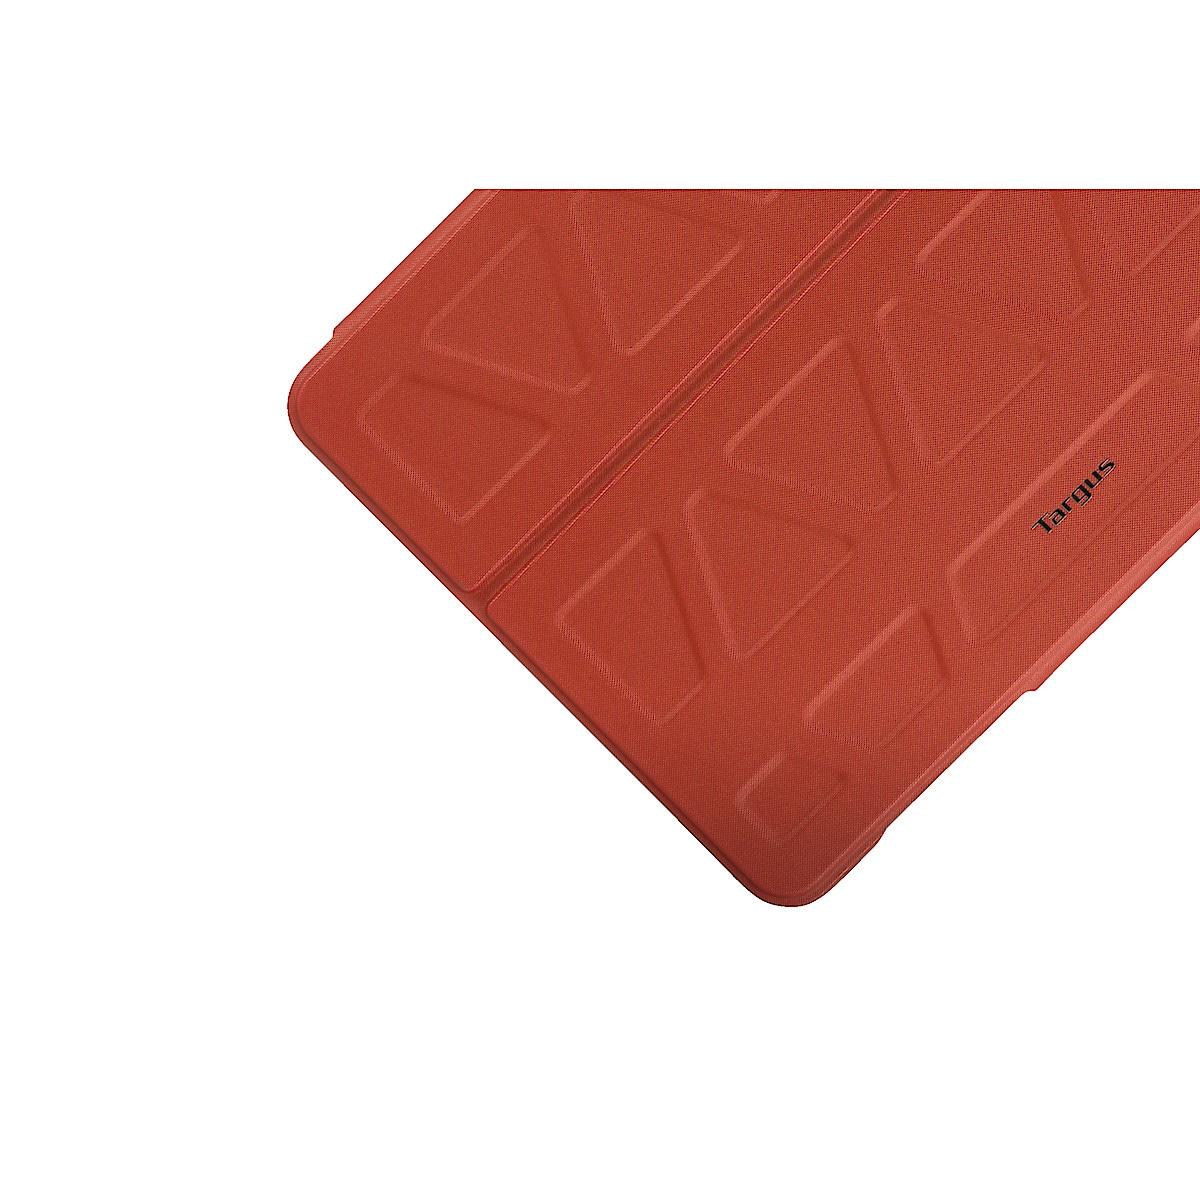 Fodral för iPad, Targus 3D Protection